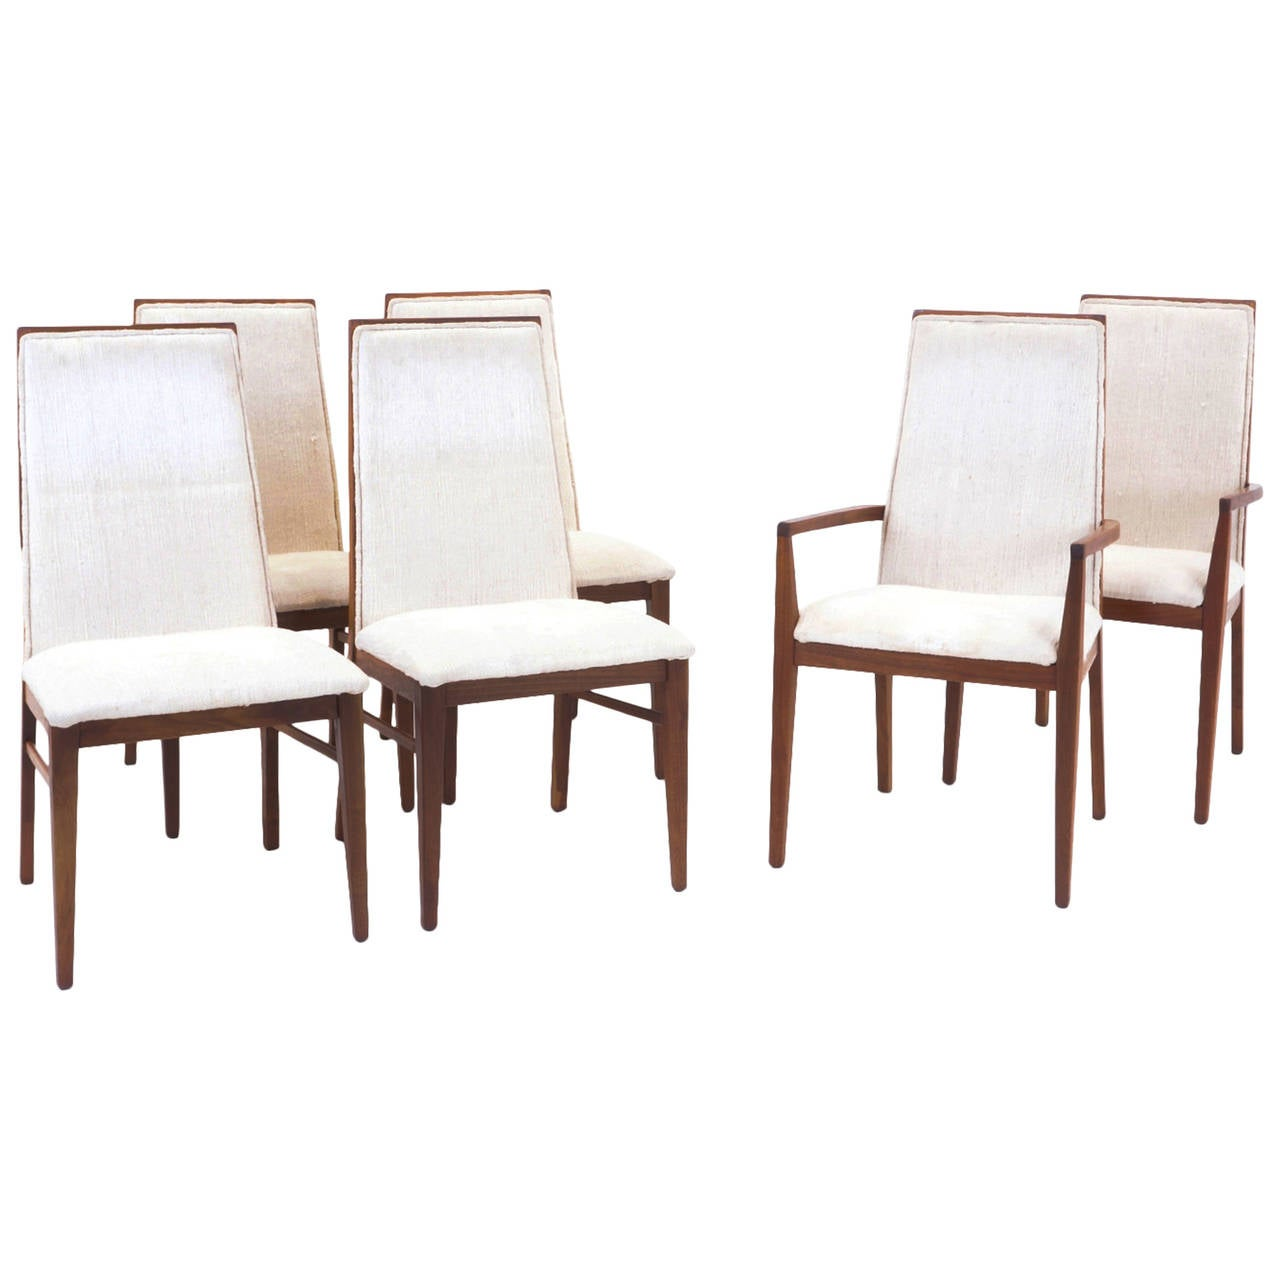 set of six milo baughman for dillingham walnut dining chairs at  - set of six milo baughman for dillingham walnut dining chairs